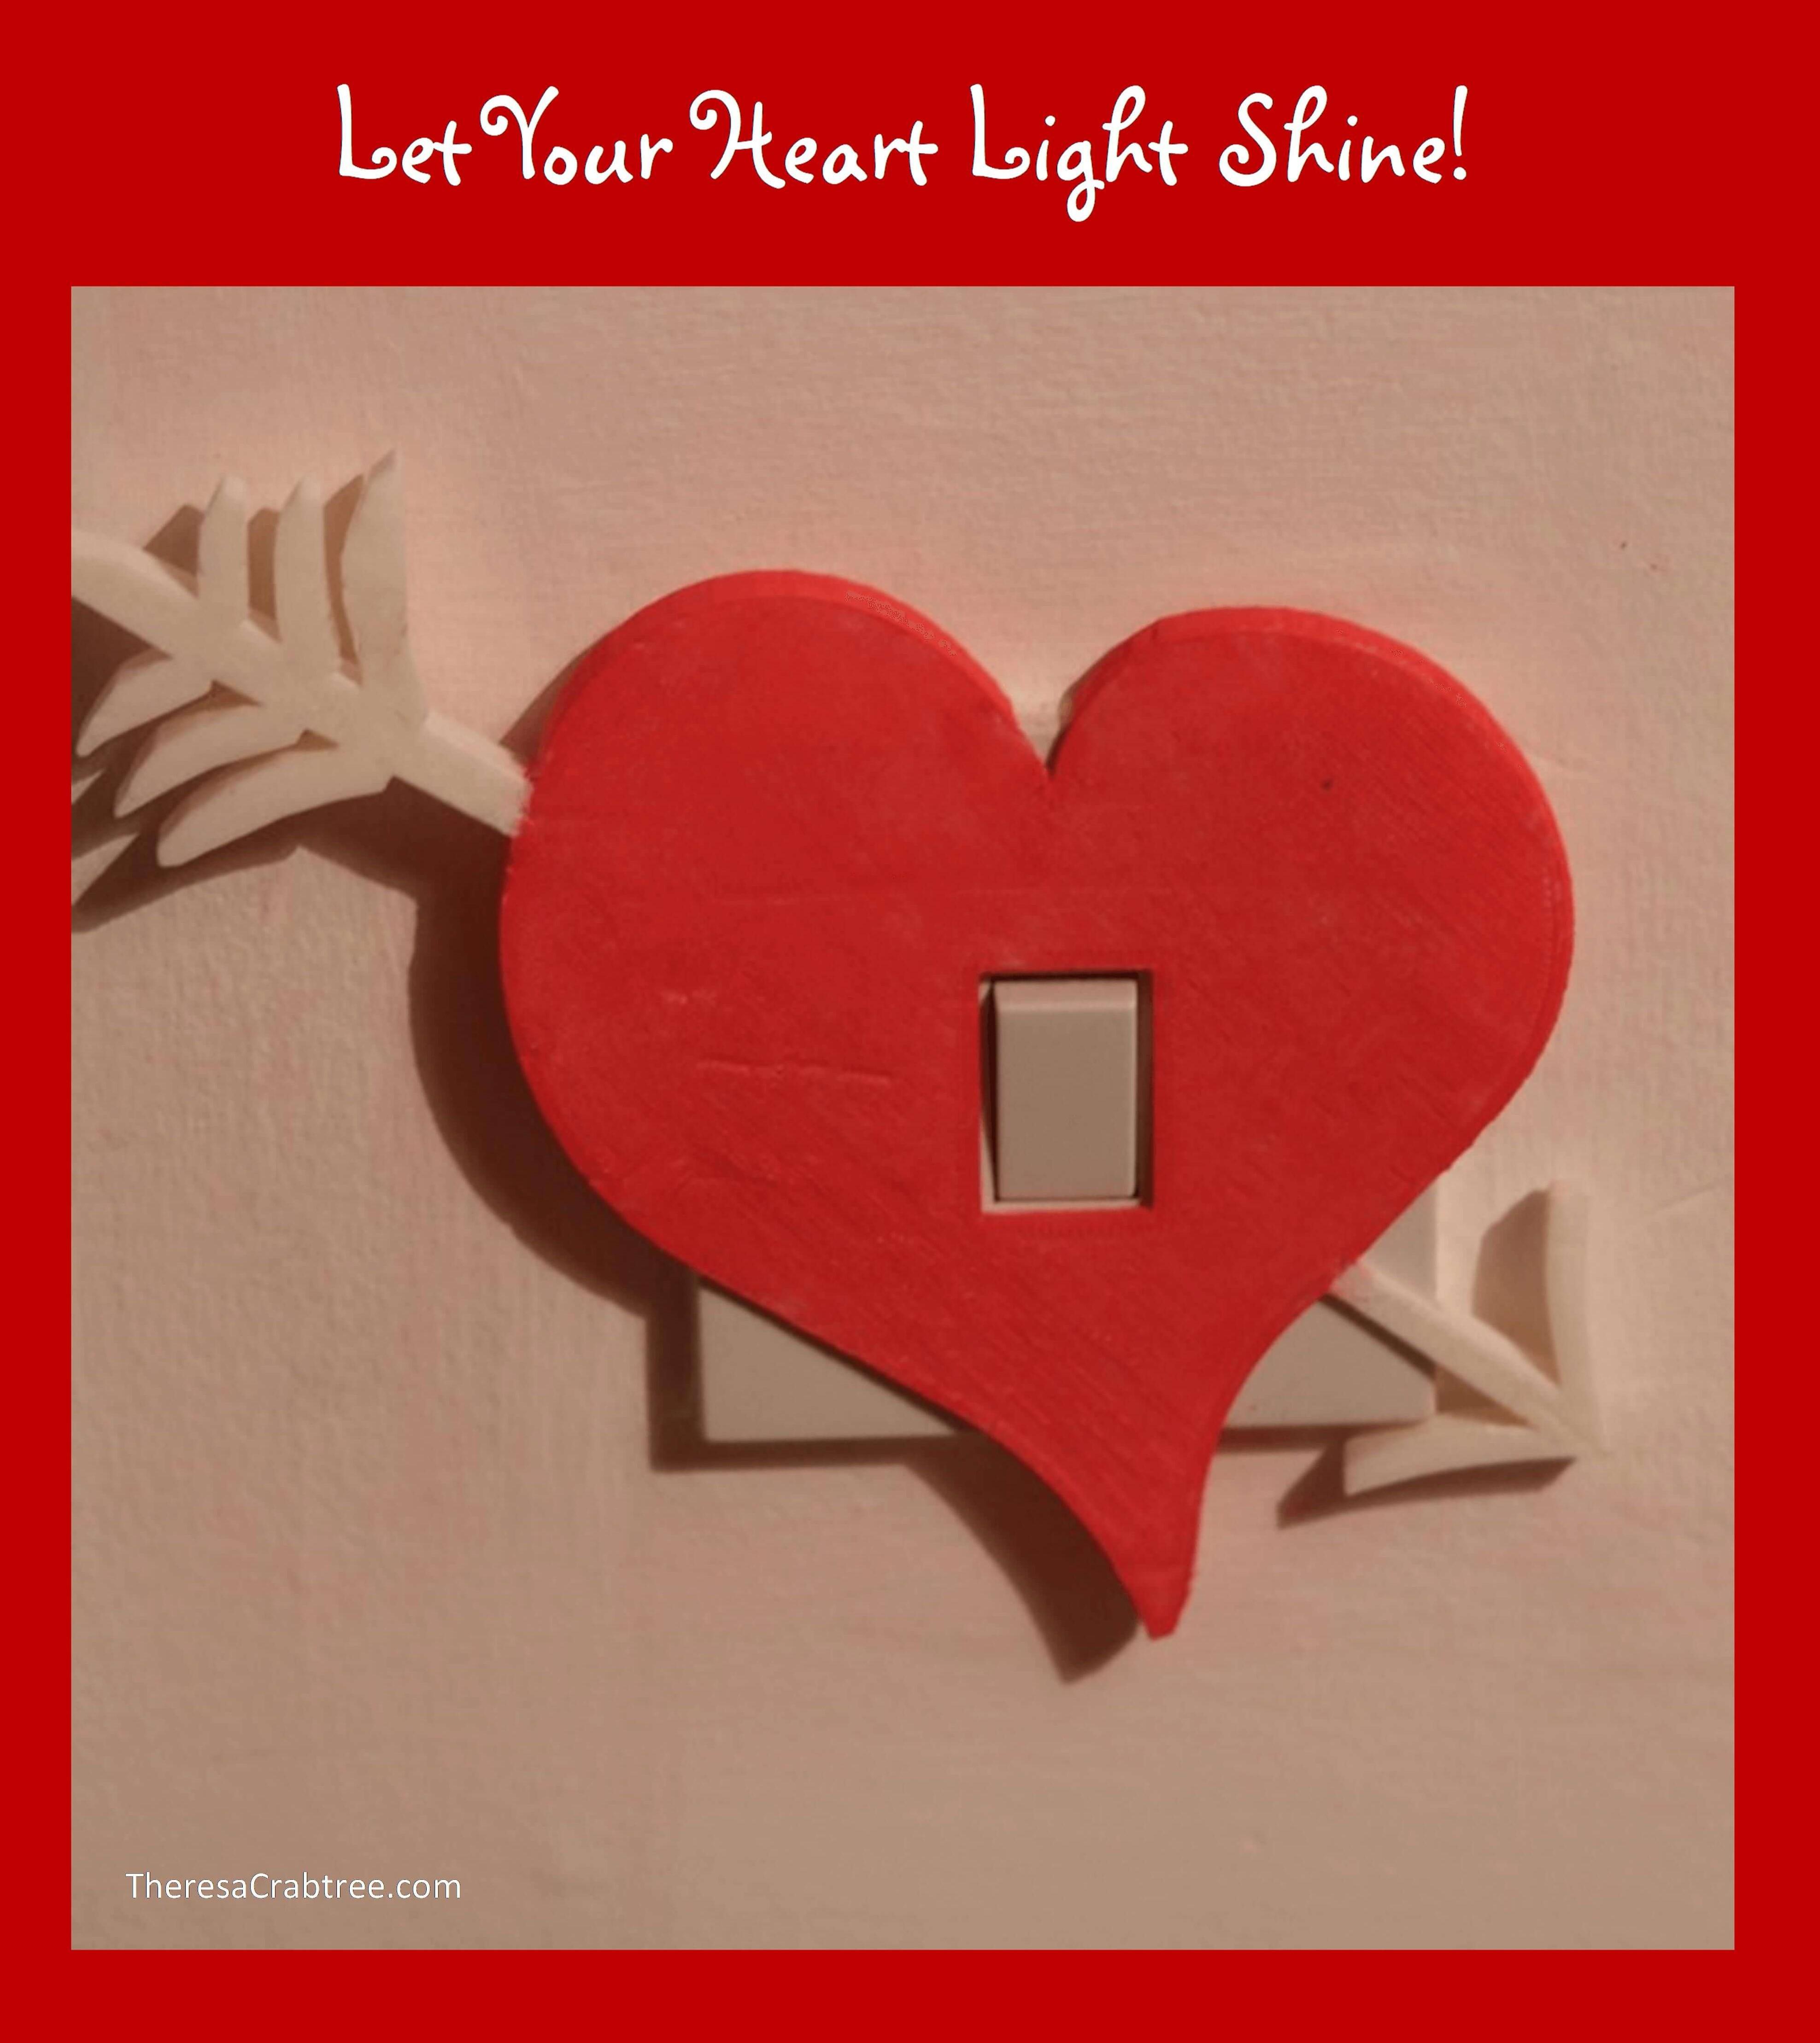 Soul Connection 249 ~ Let Your Heart Light Shine!